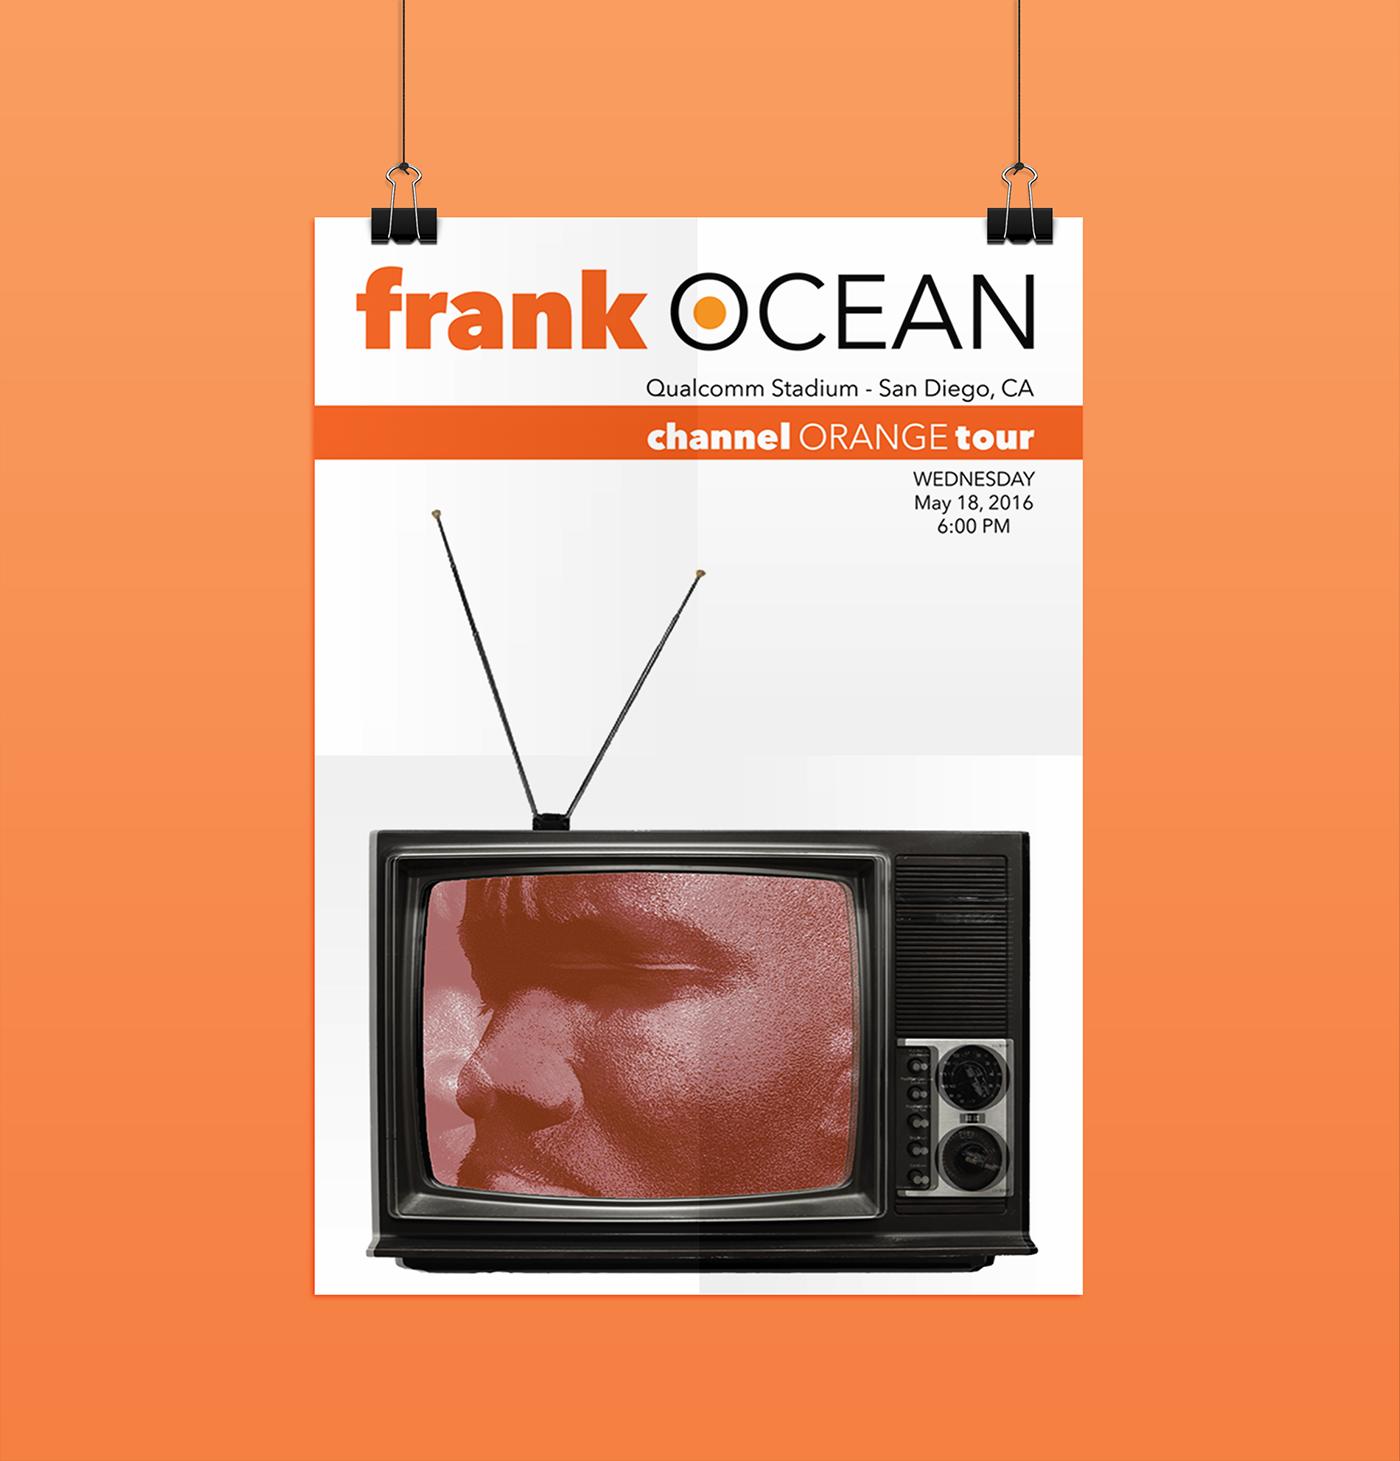 frank ocean concert posters on behance